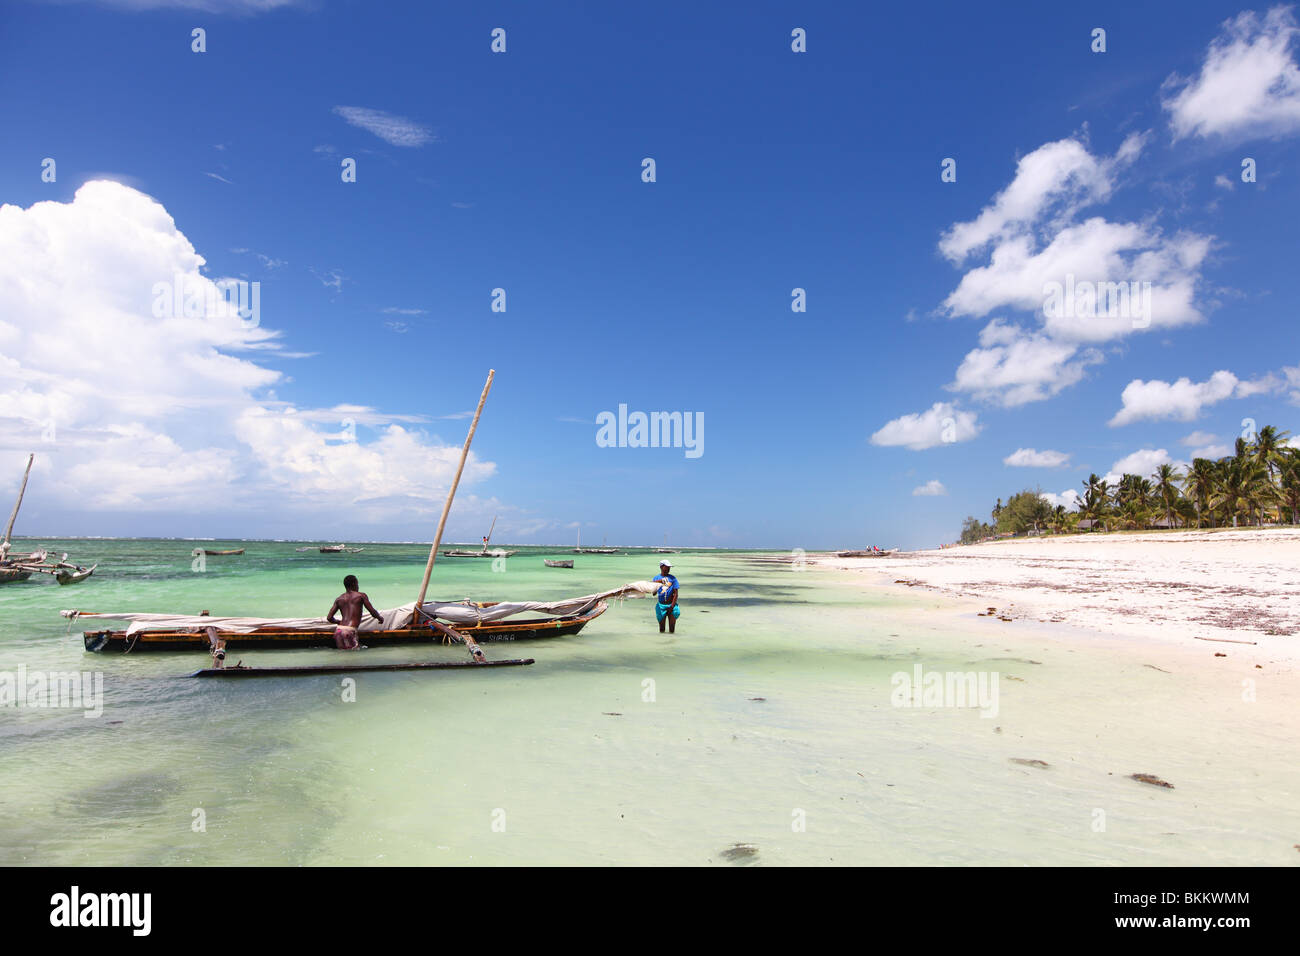 Kenya, Mombasa, Africa, Dugout Fishing Canoe, Dhow, dhows at Diani beach - Stock Image